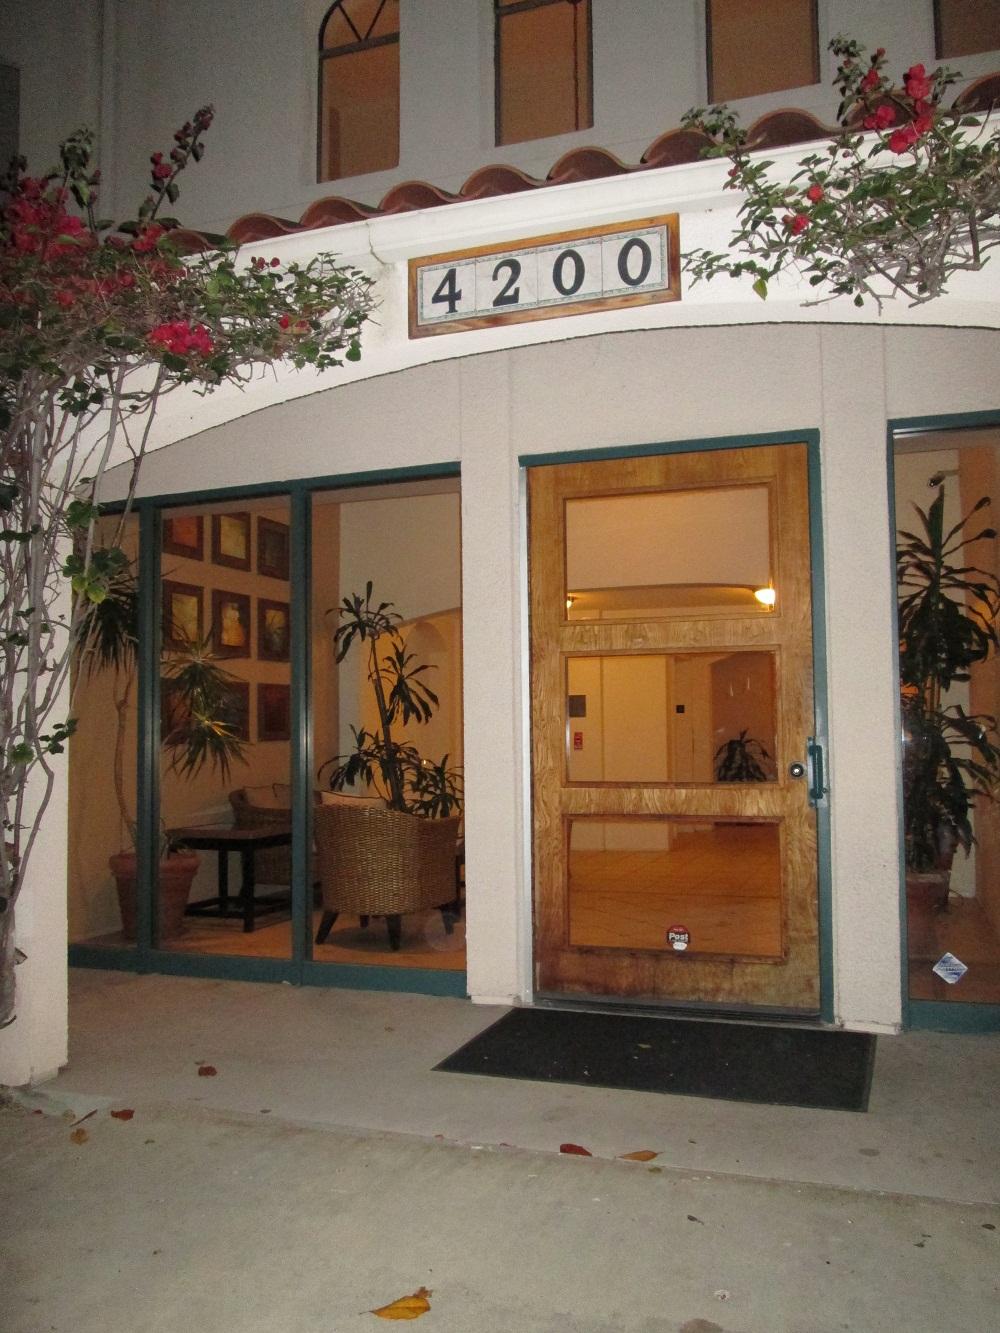 Los Angeles CA - Linden Heights Monterey Hills Condos For Sale Update